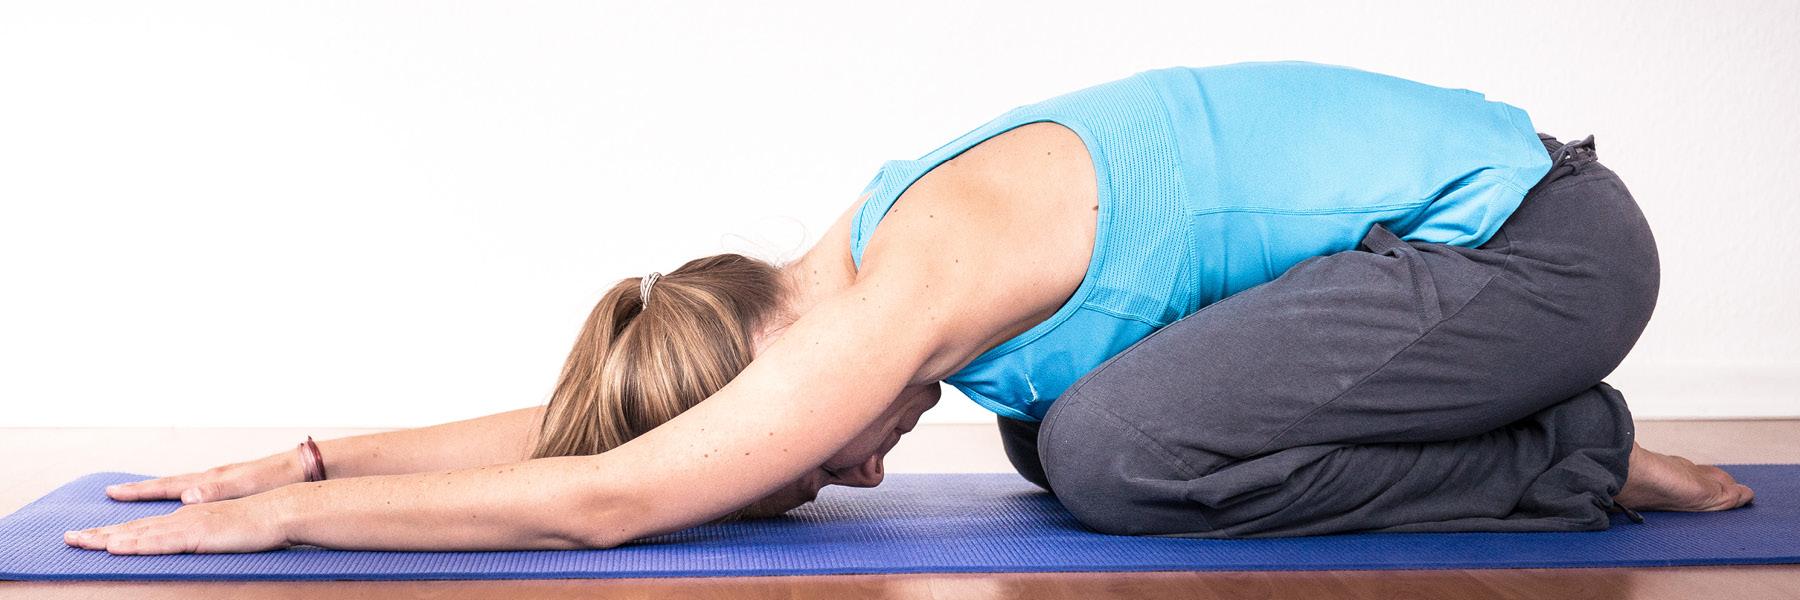 Pilates-Training bei Heilpraktikerin Anna F. Rohrbeck in Berlin